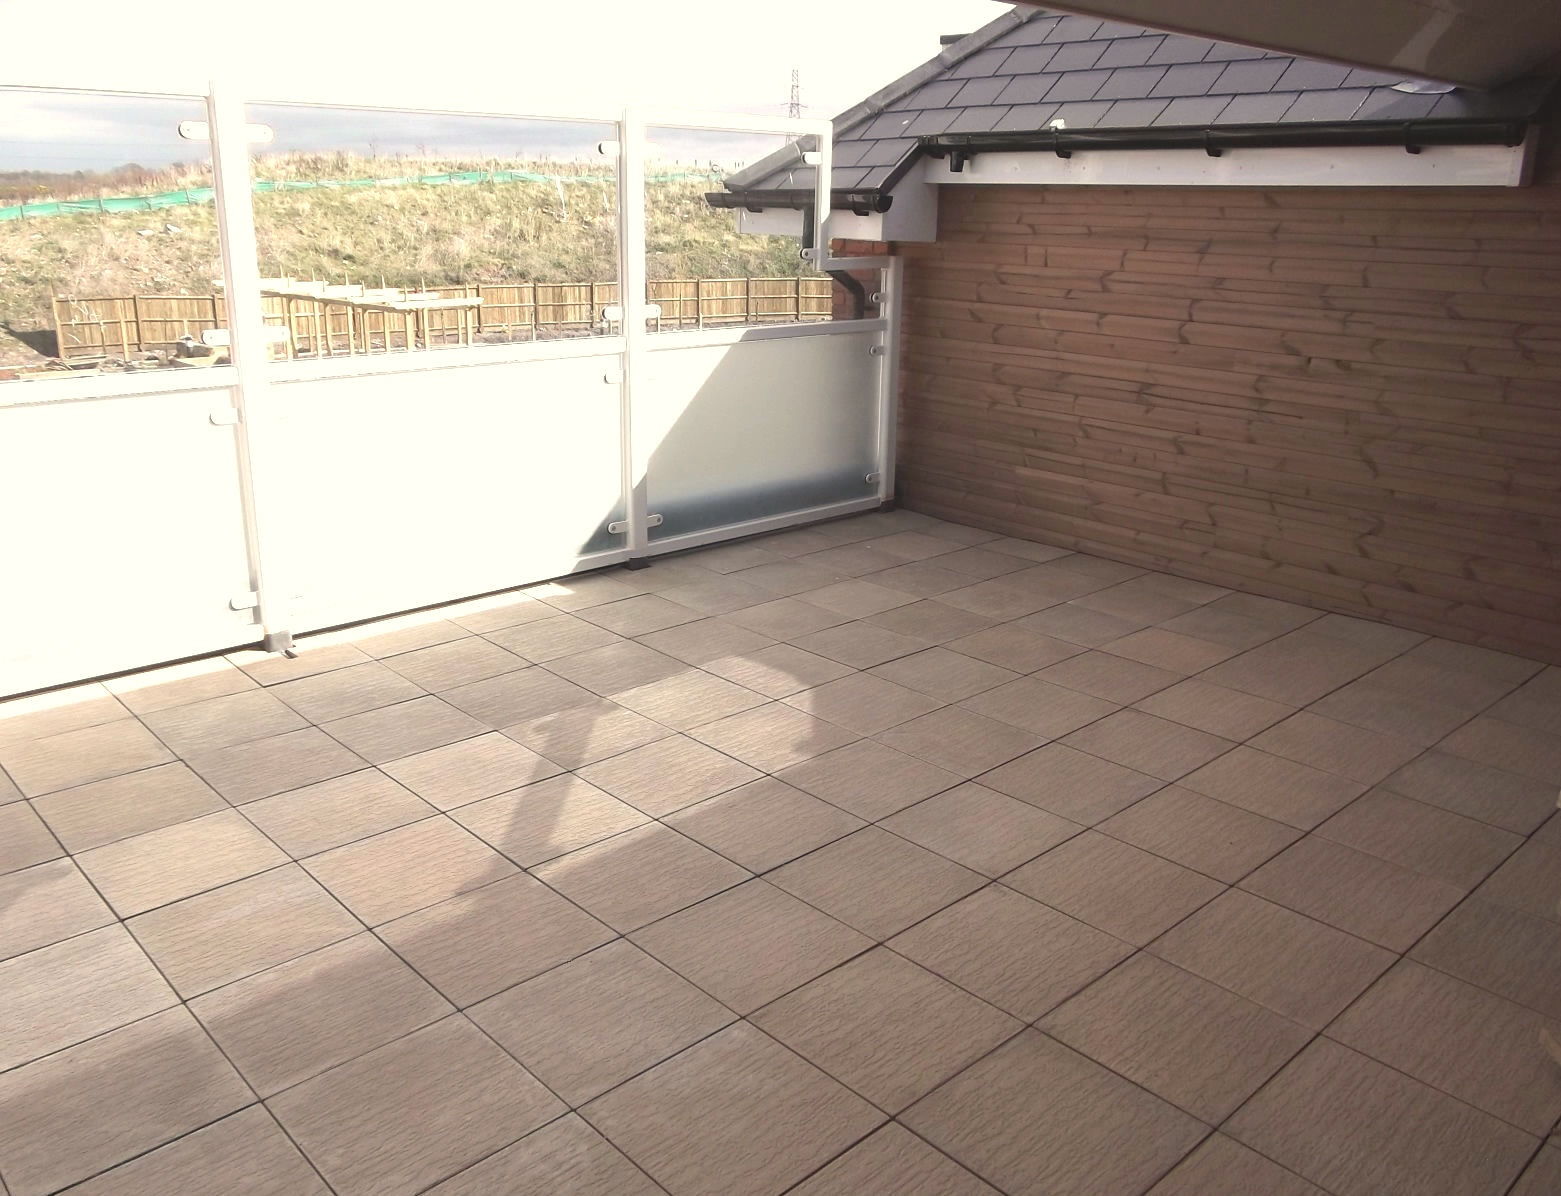 Promenade Tile Installation R Amp D Roofing